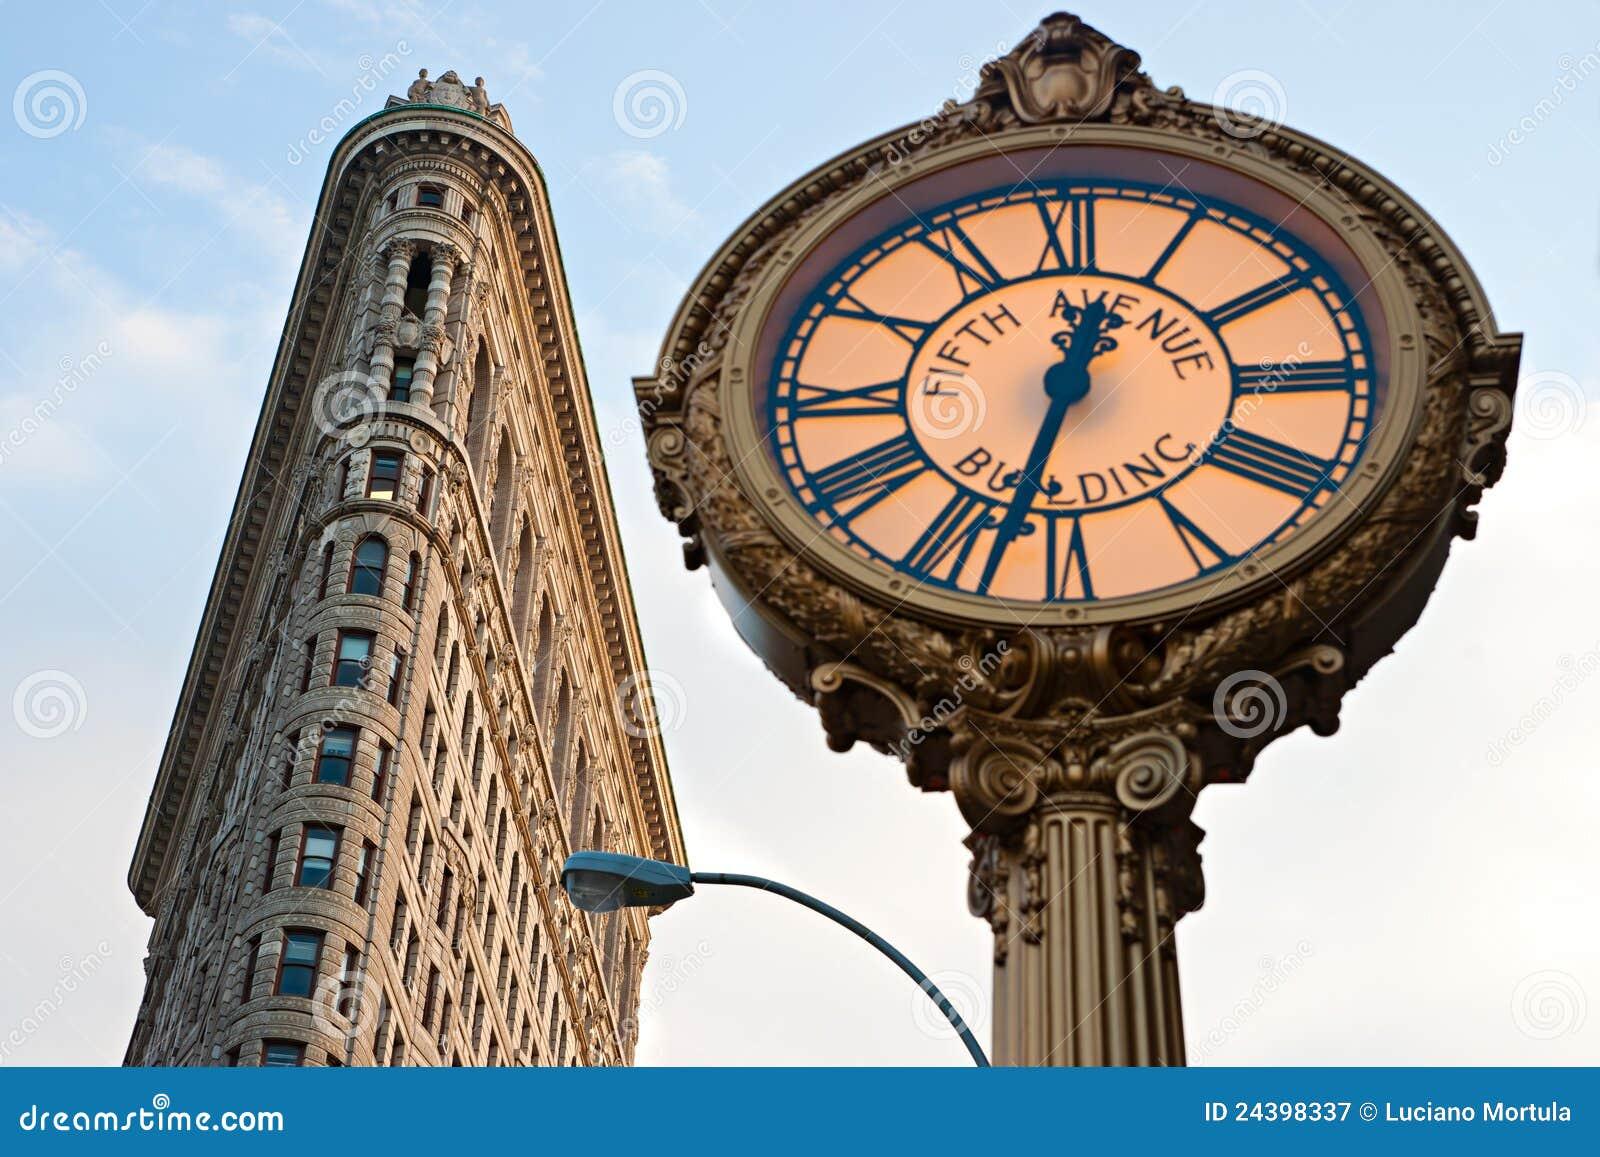 The Flat Iron building, Manhattan, new York city.